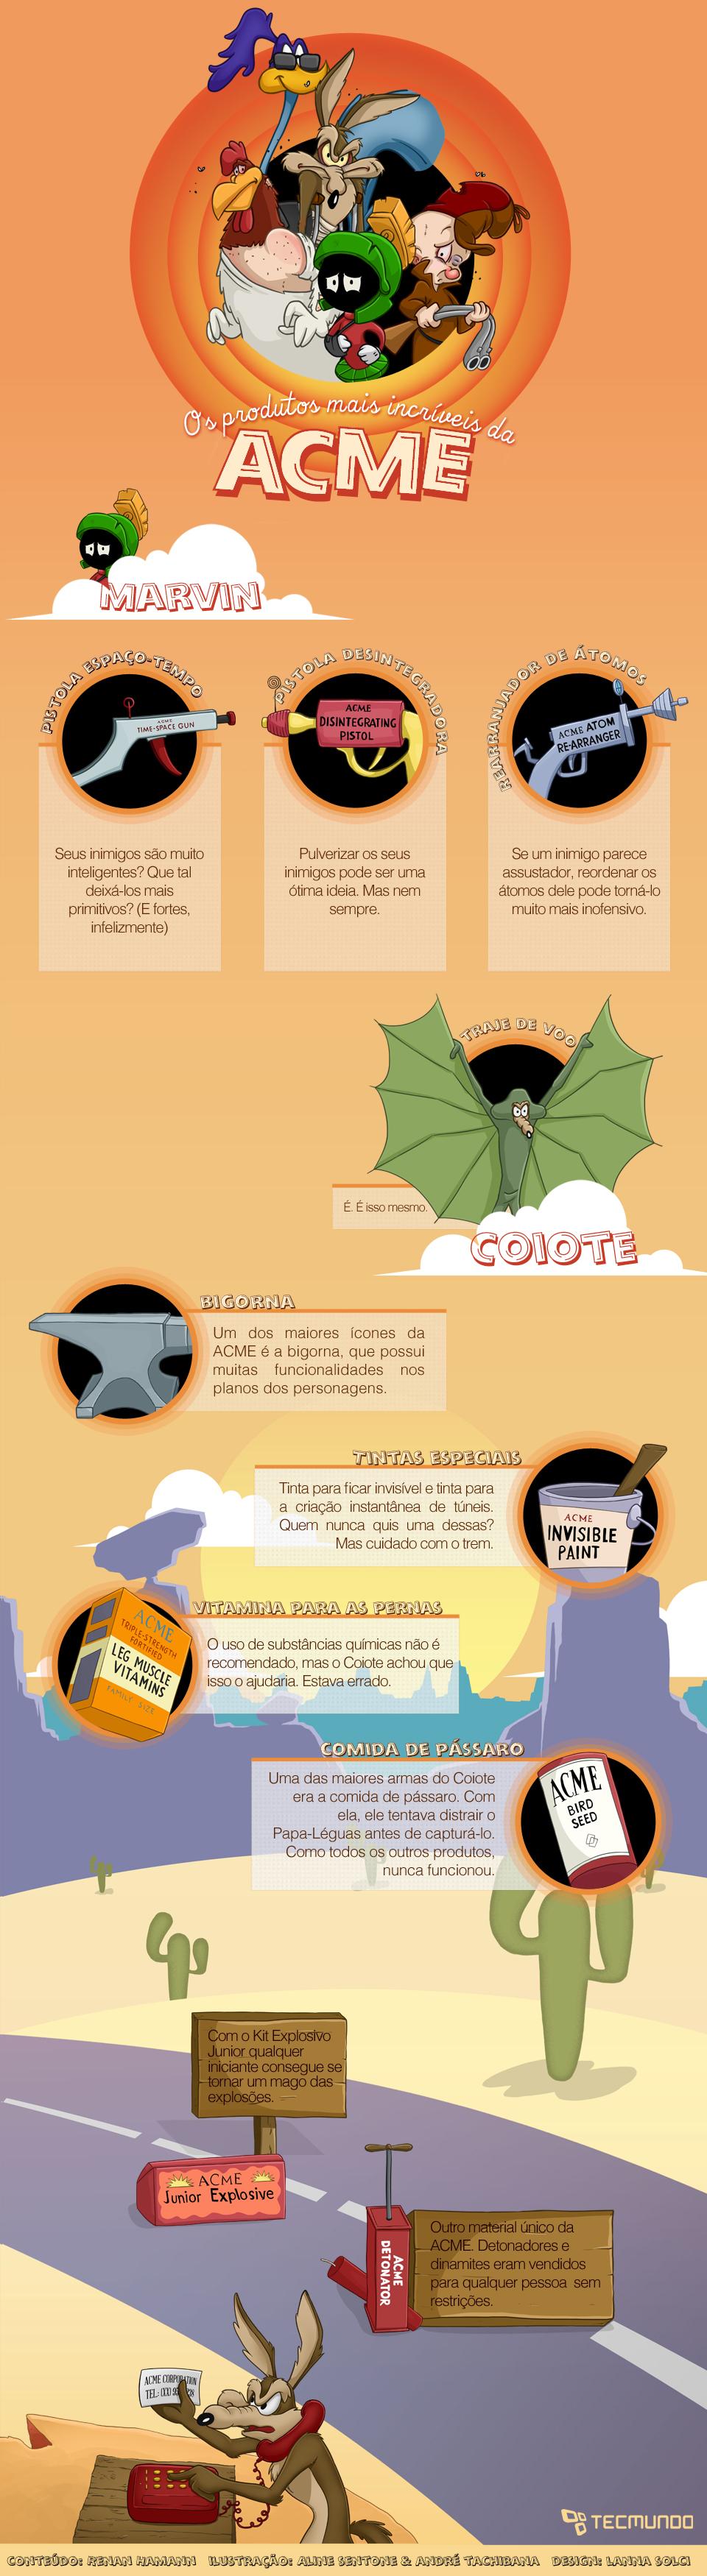 acme infográfico